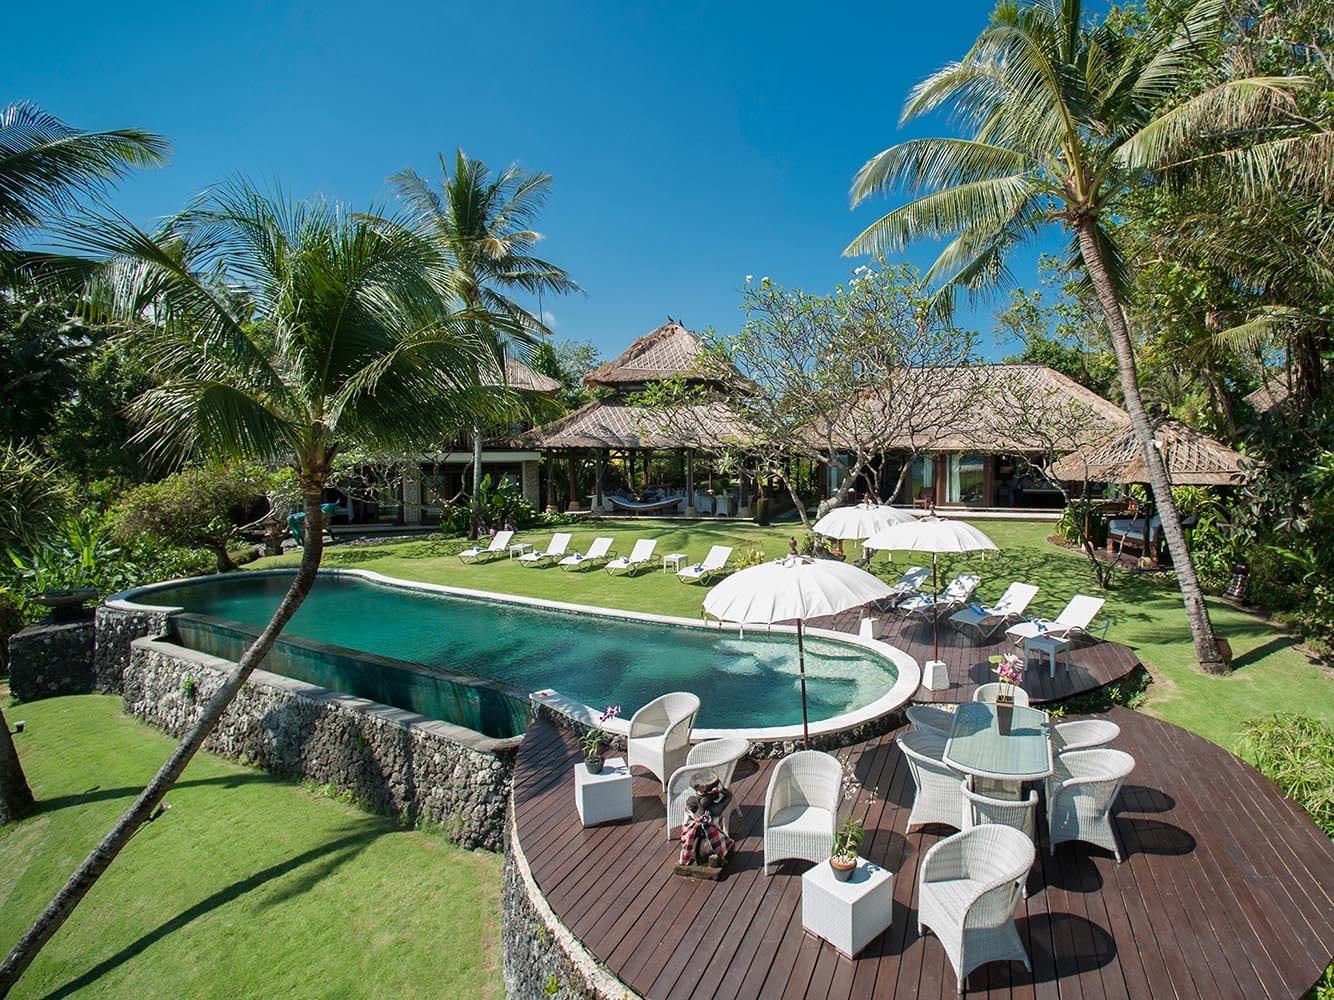 Sungai Tinggi Beach Villa, Canggu, Bali, Indonesia